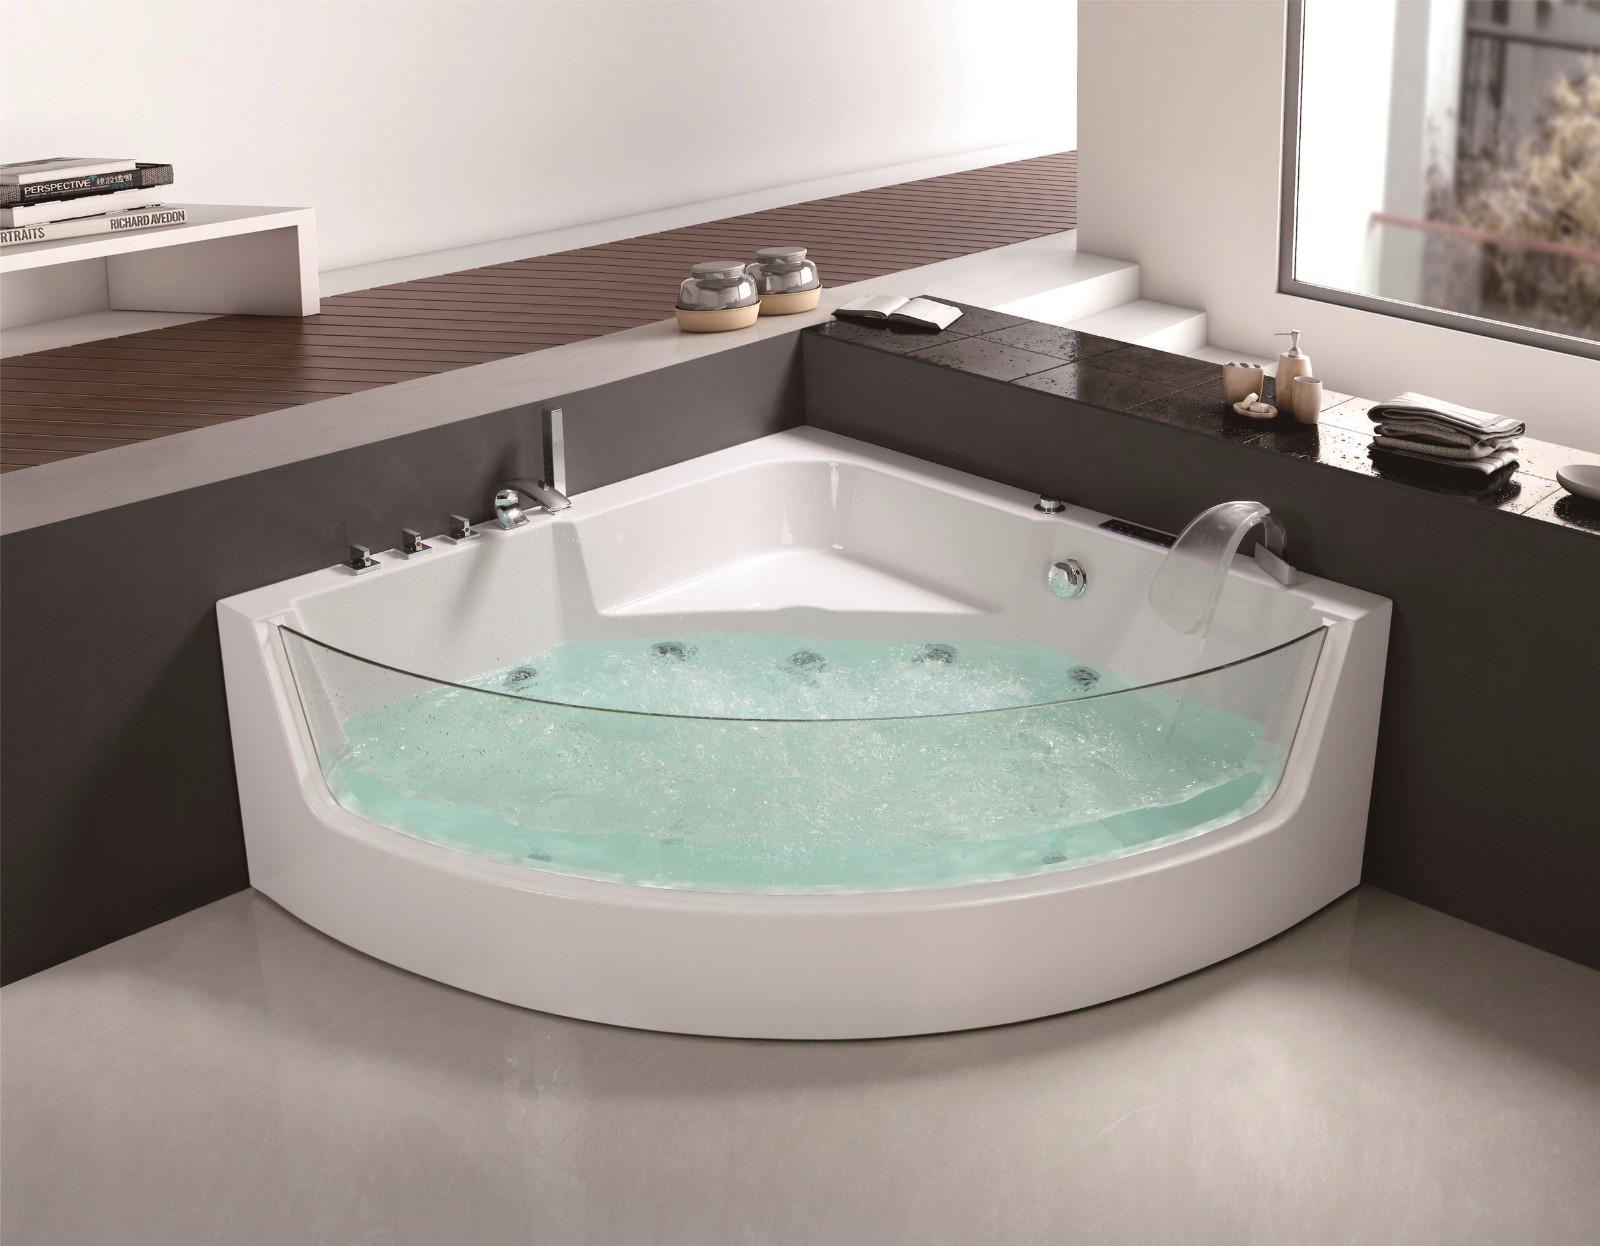 C-400 C-401  Luxury Round  Massage Acrylic  Glass Large Hot Tub Bathroom Bathtub with Cheap Price.jpg